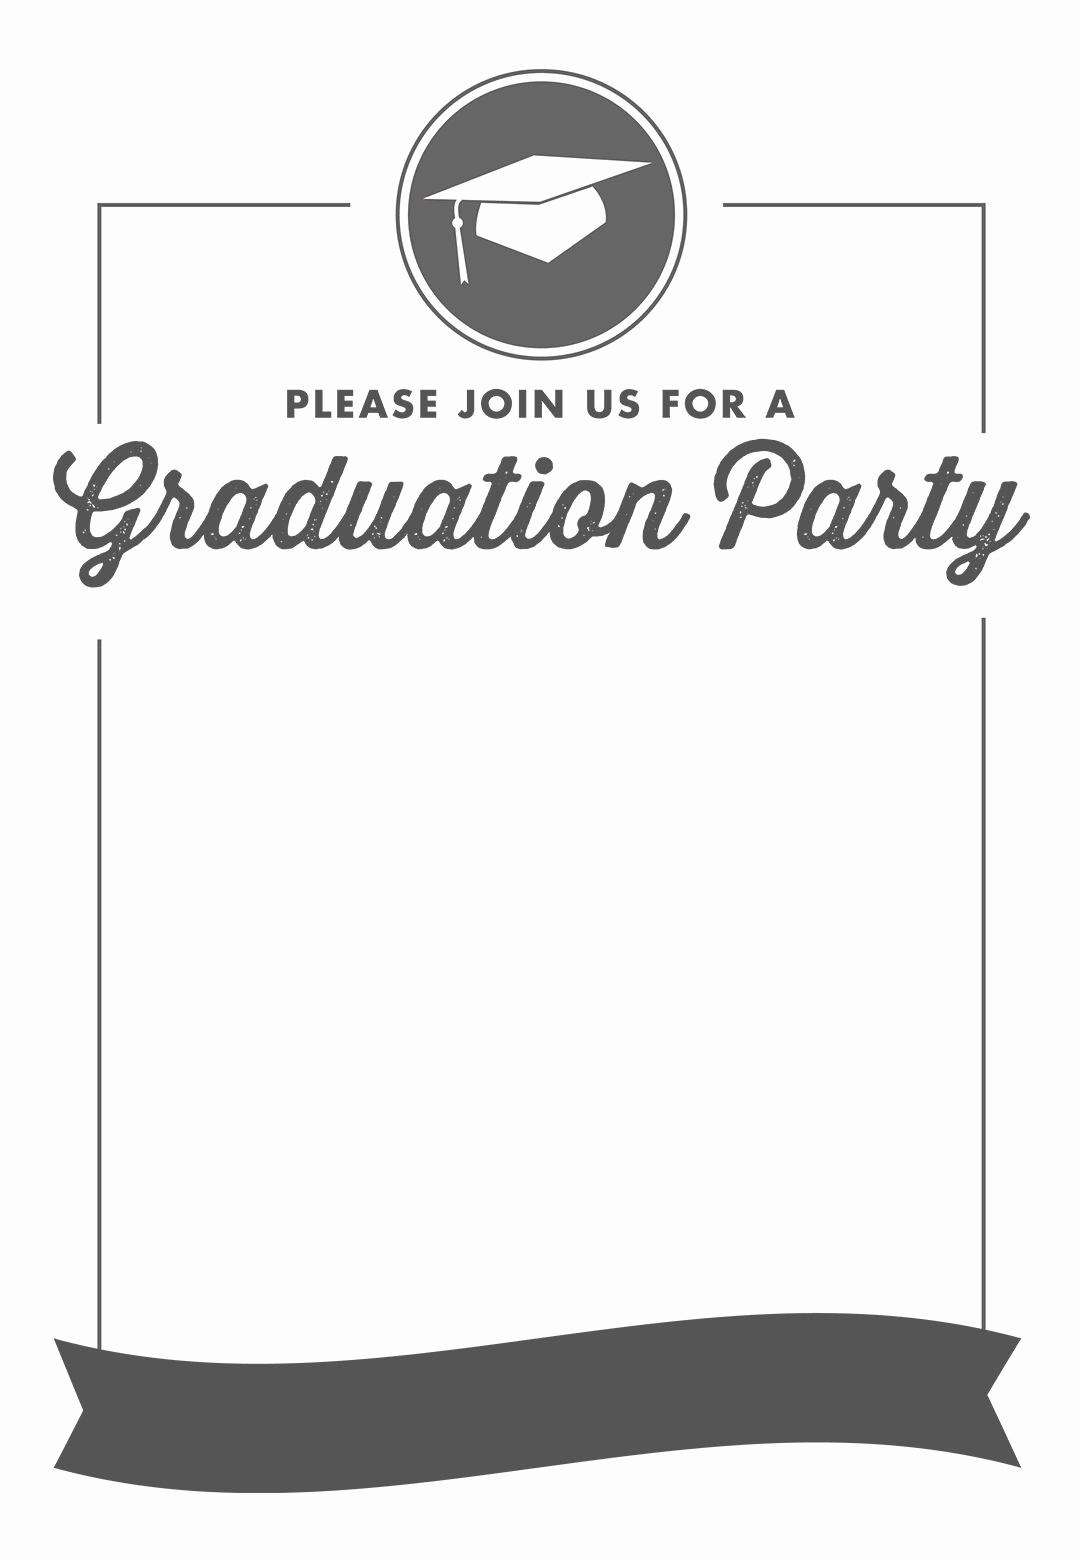 Free Graduation Party Invitation Templates Inspirational Ribbon Graduation Free Printable Graduation Party